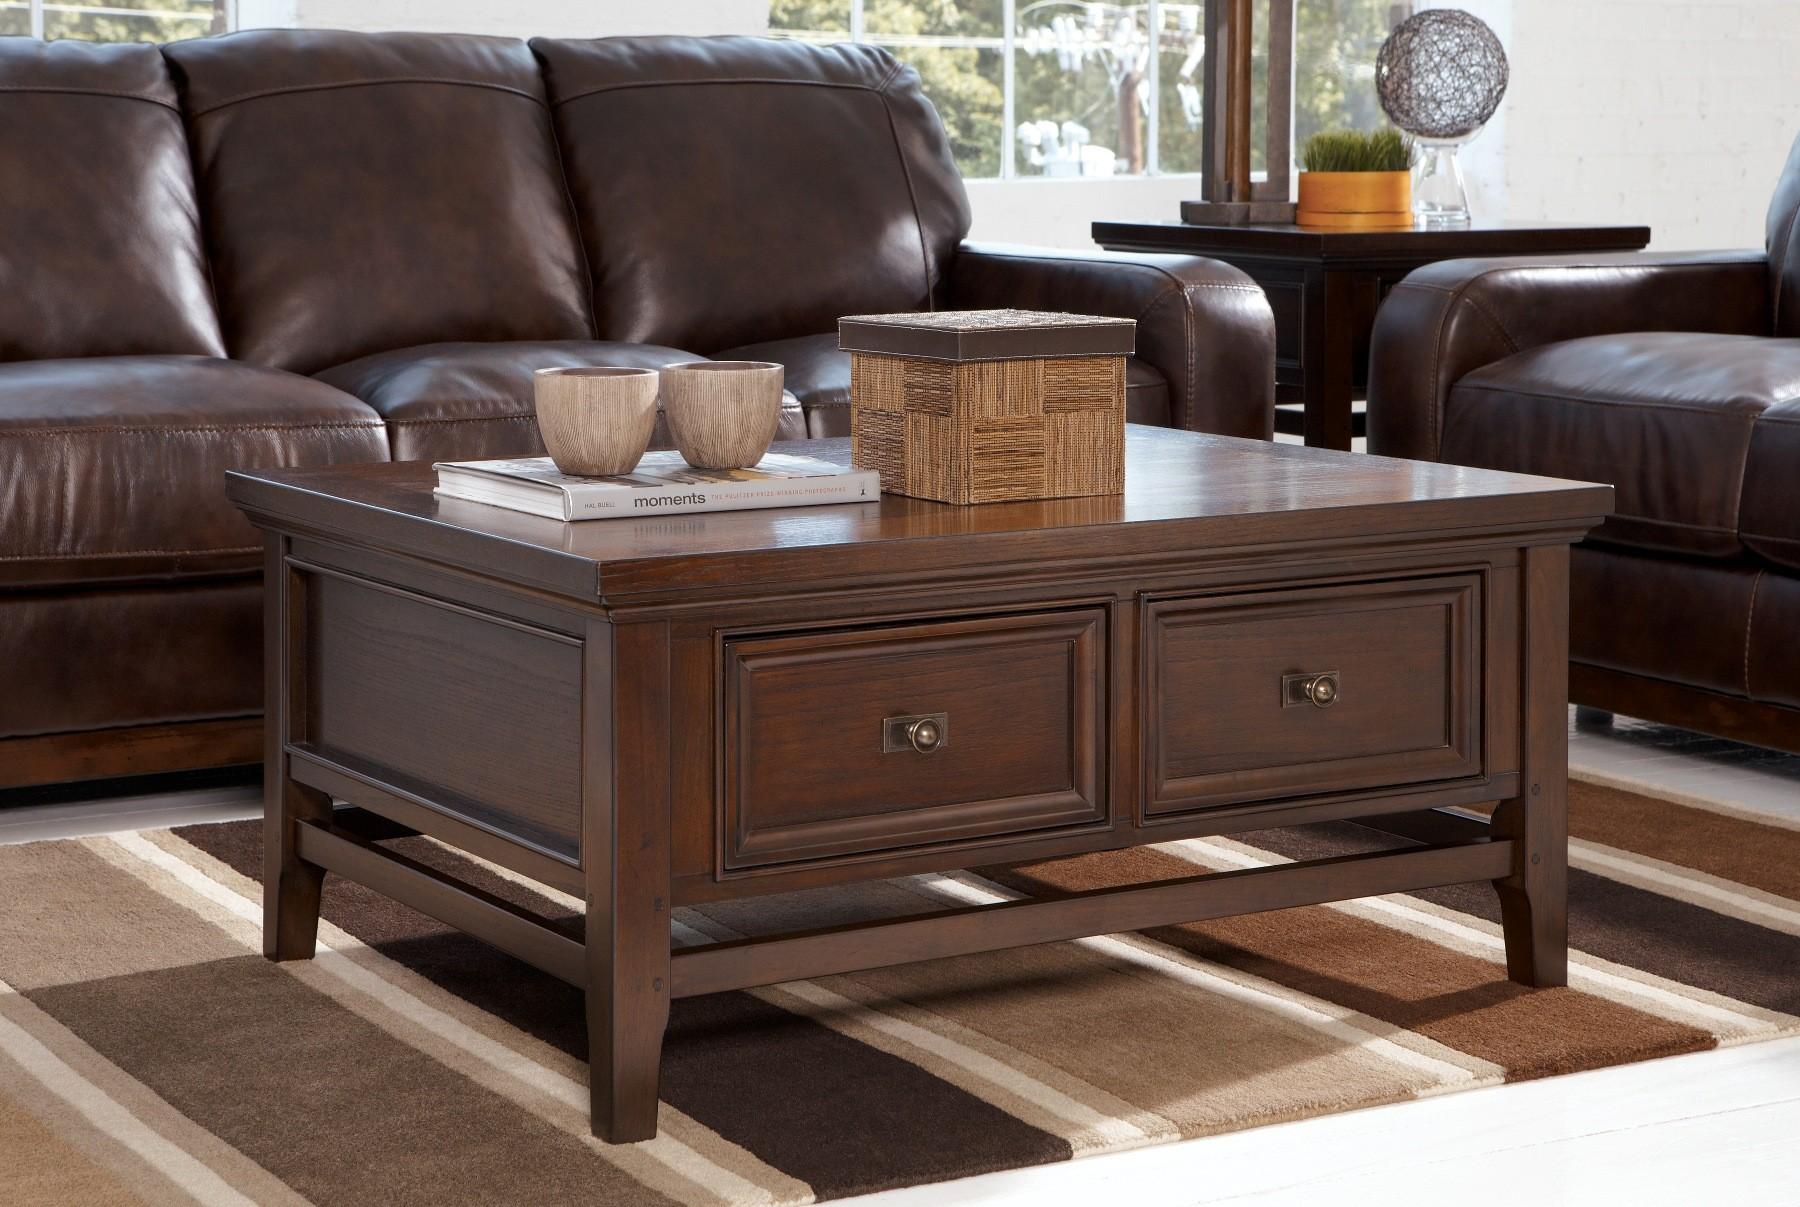 Ashley Furniture Kenwood Loft Free Home Design Ideas Images